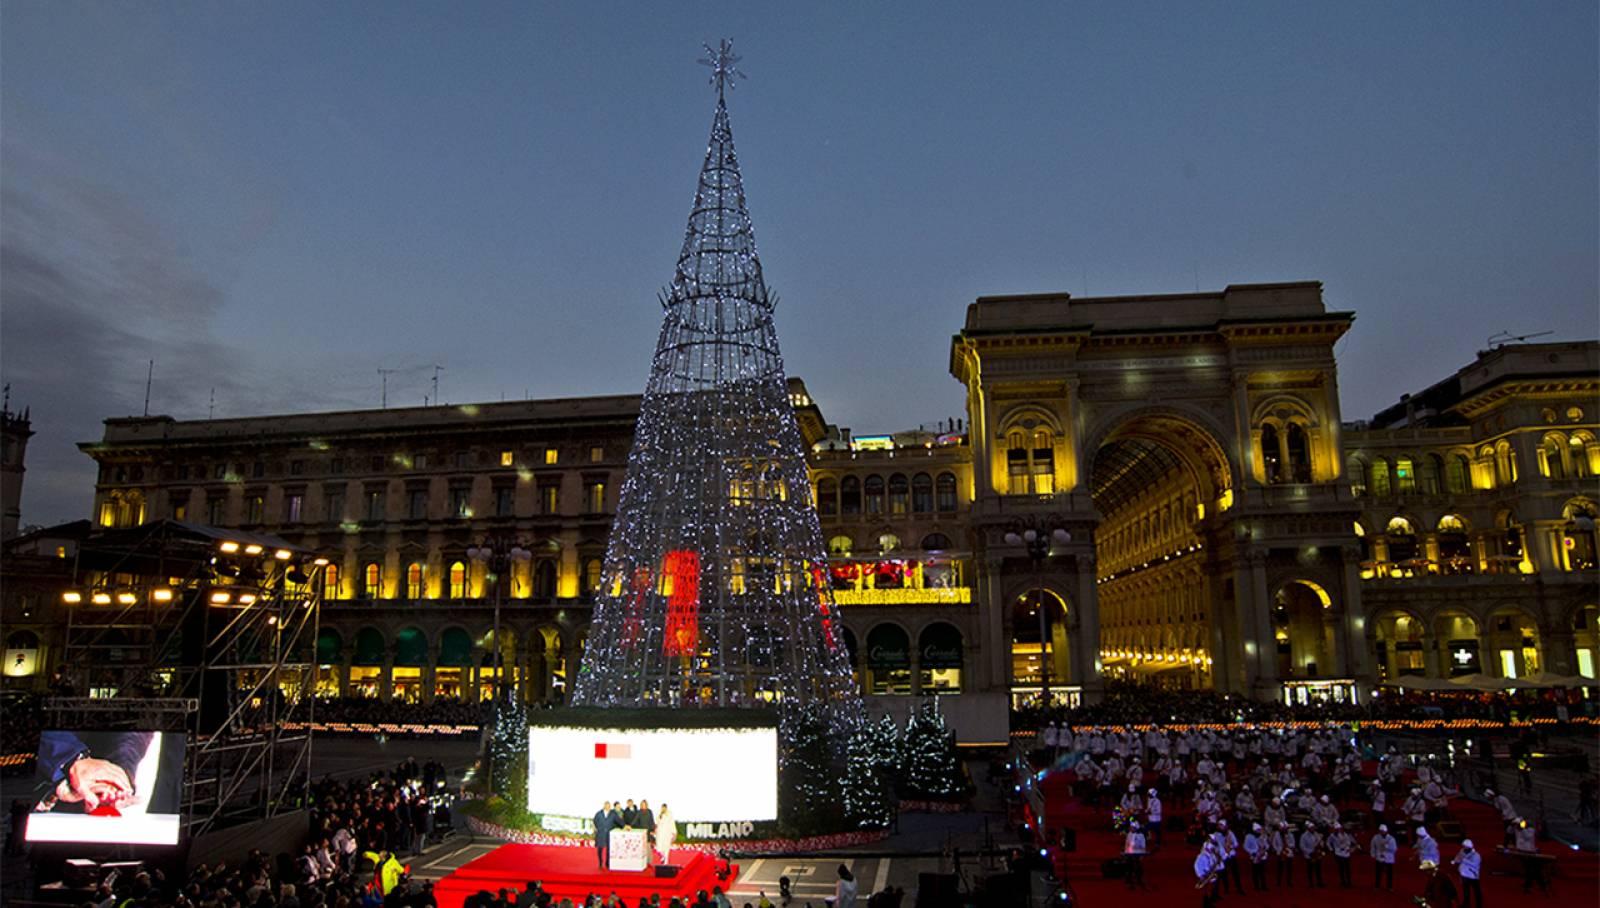 Esselunga Albero di Natale IGPDecaux Milano Piazza Duomo 2019